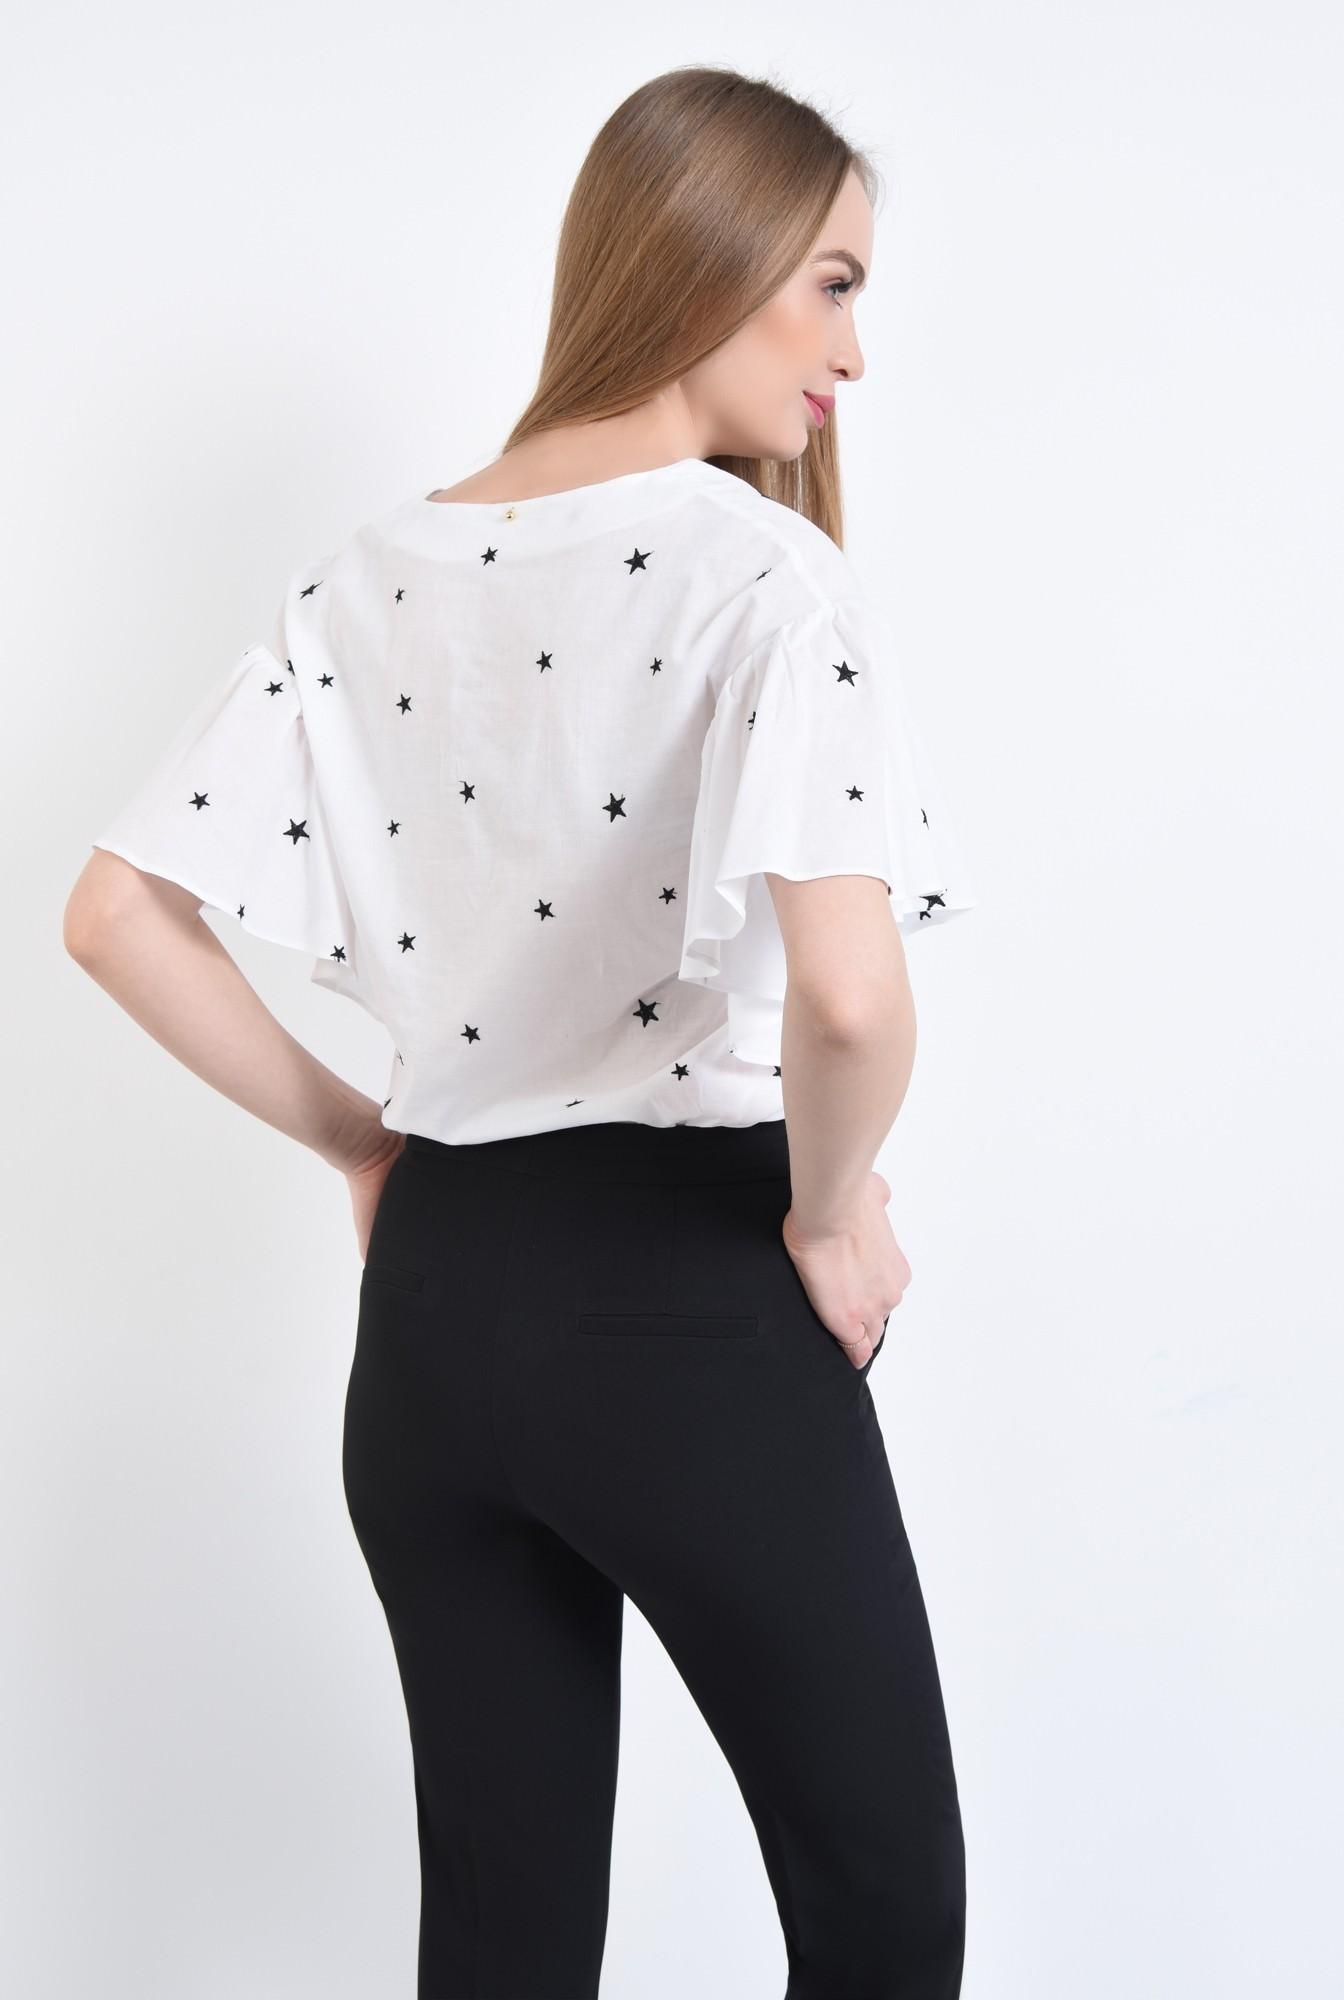 1 - Bluza casual, alb, anchior